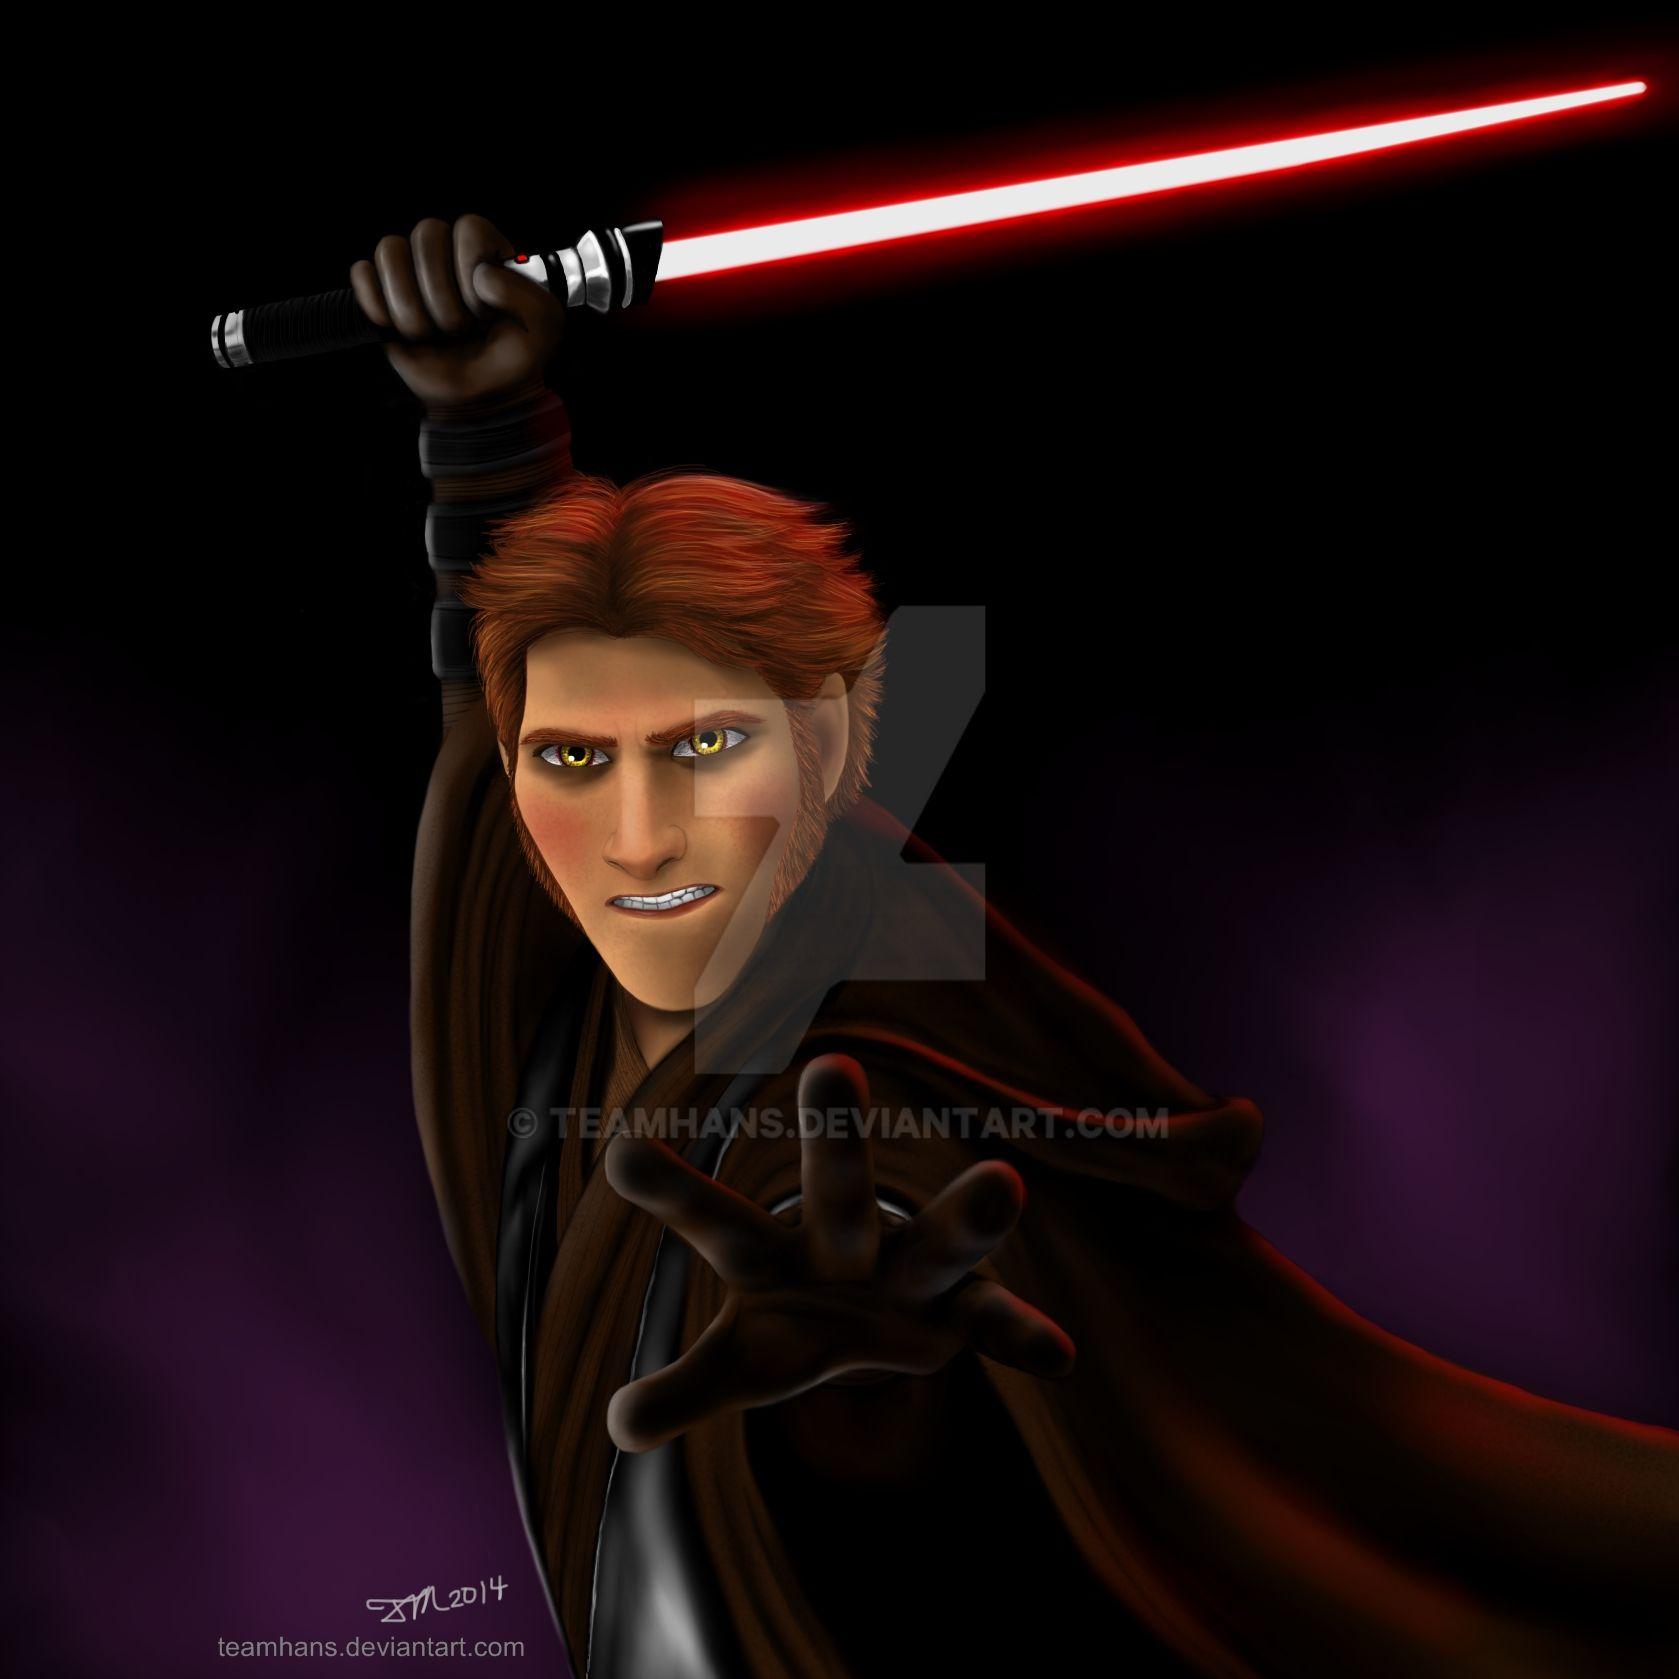 Sith Hans by teamhans